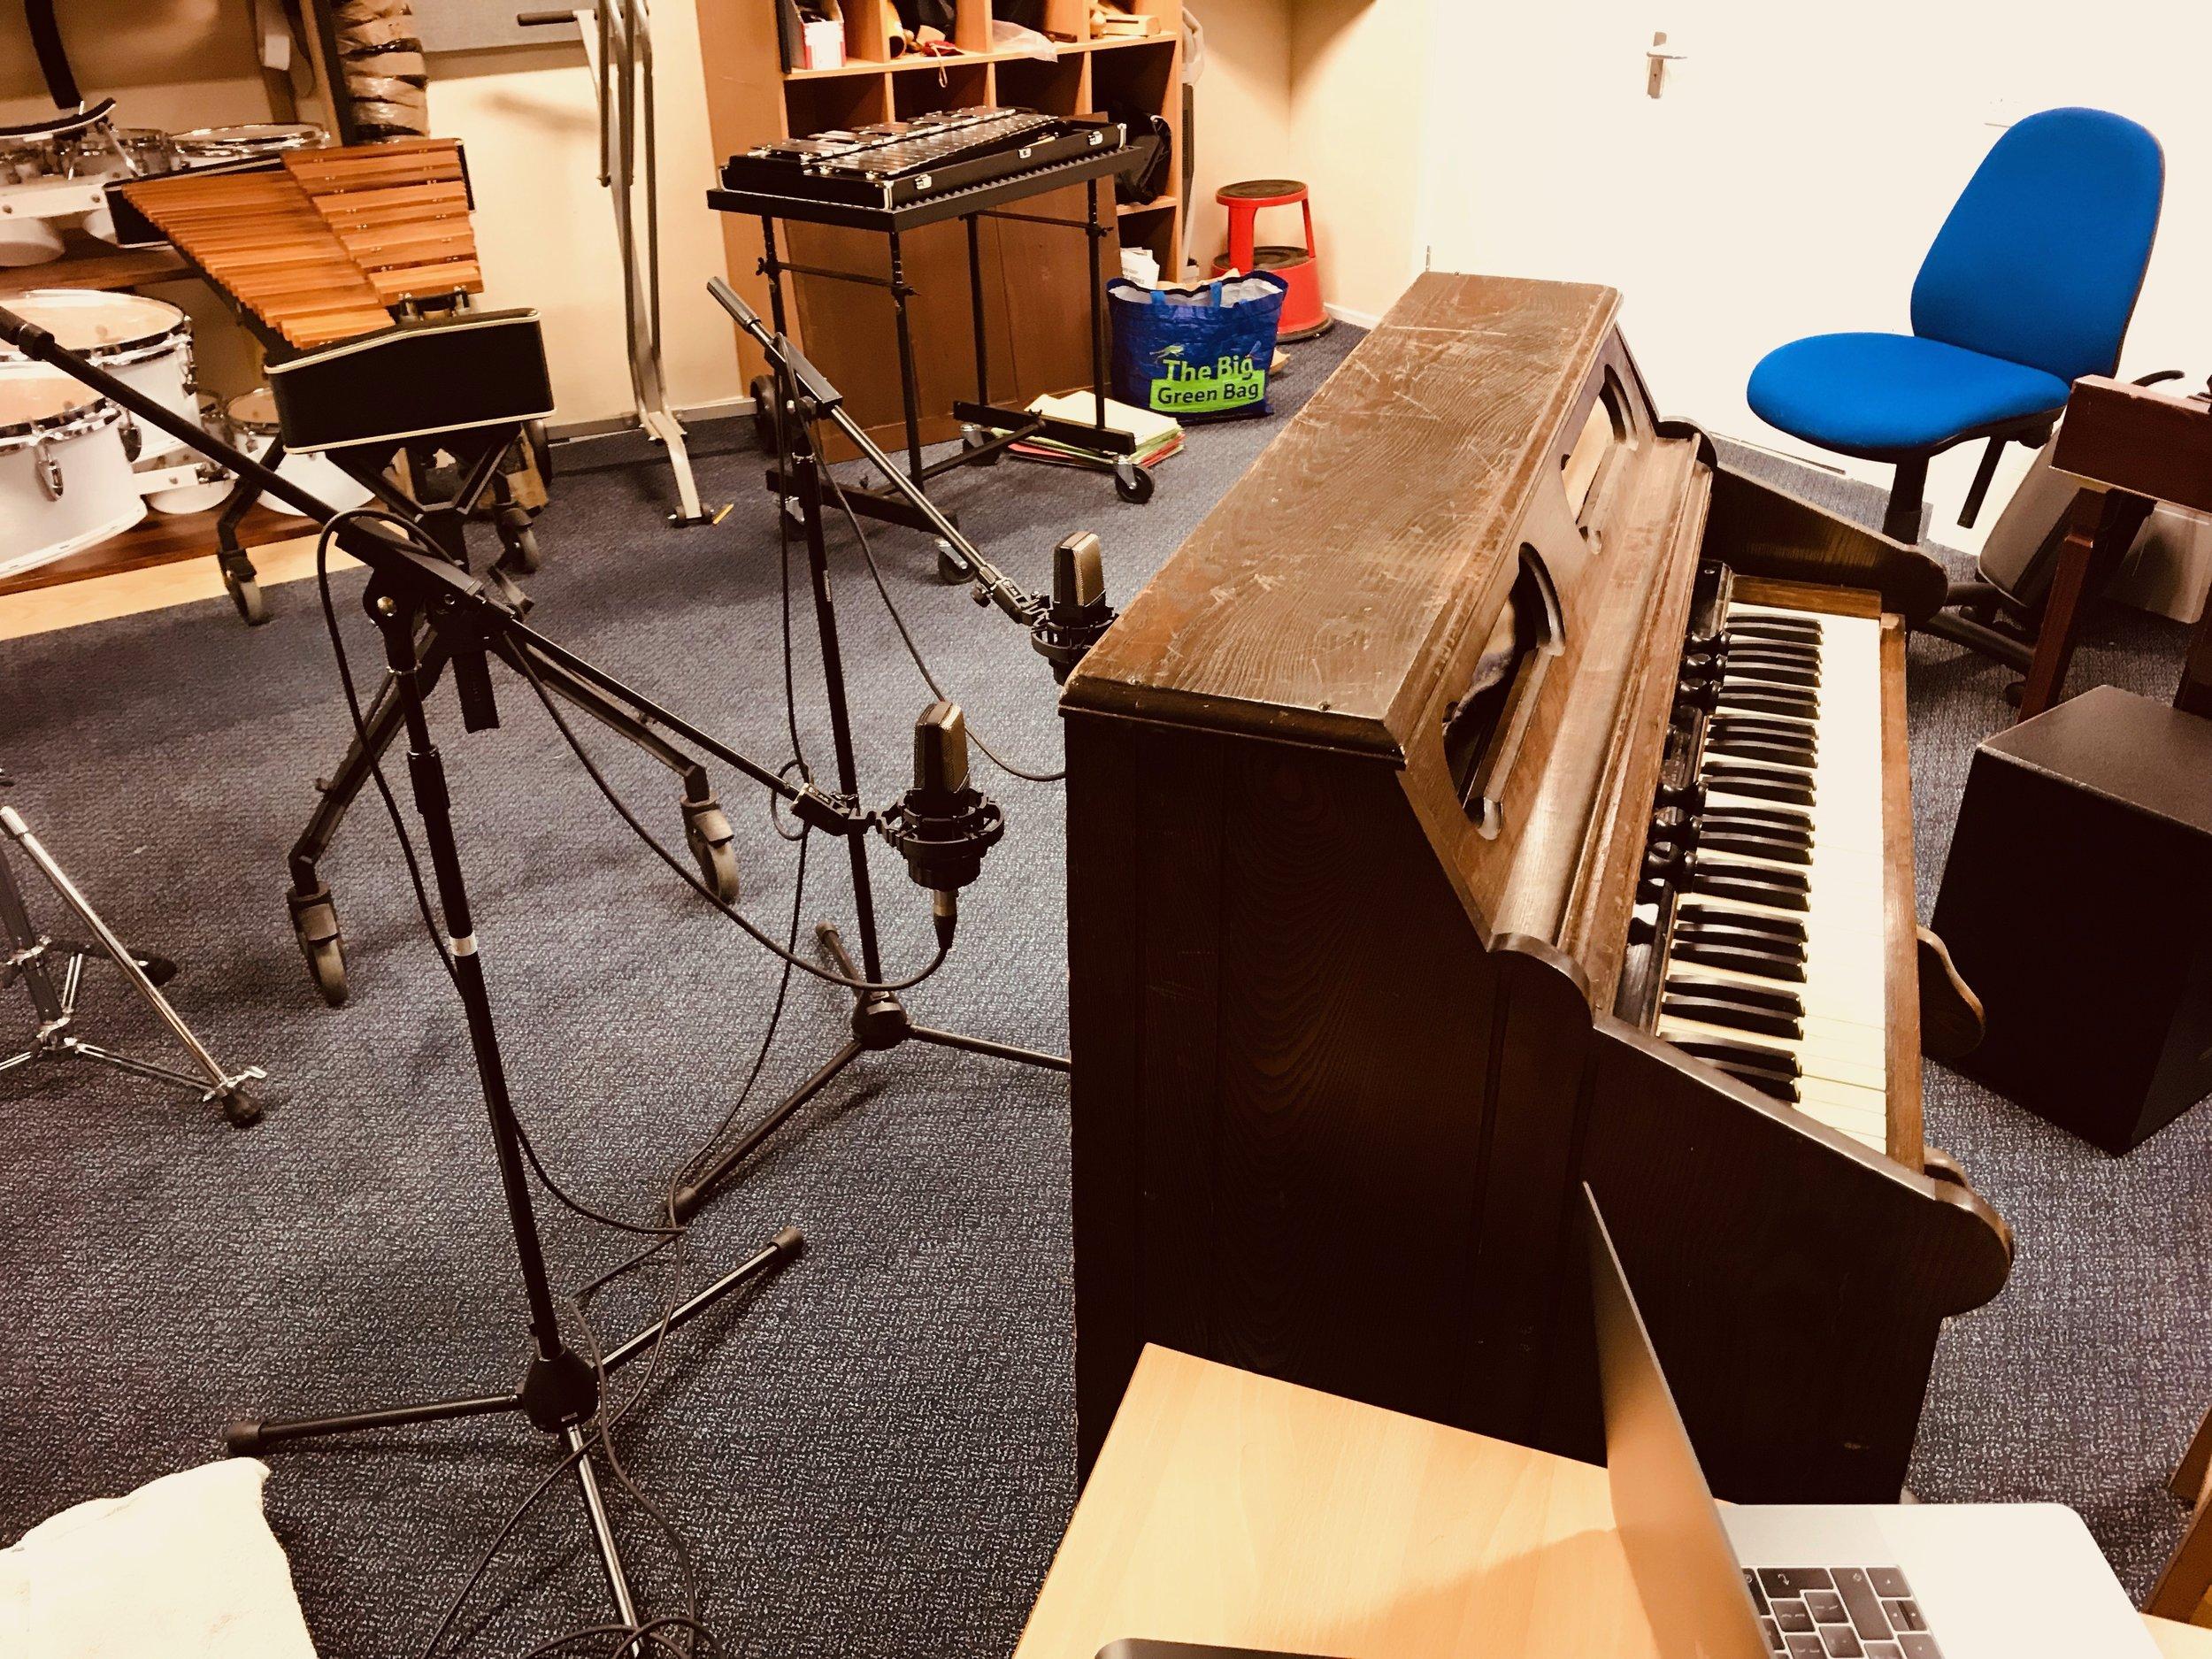 Revival Reed Organ